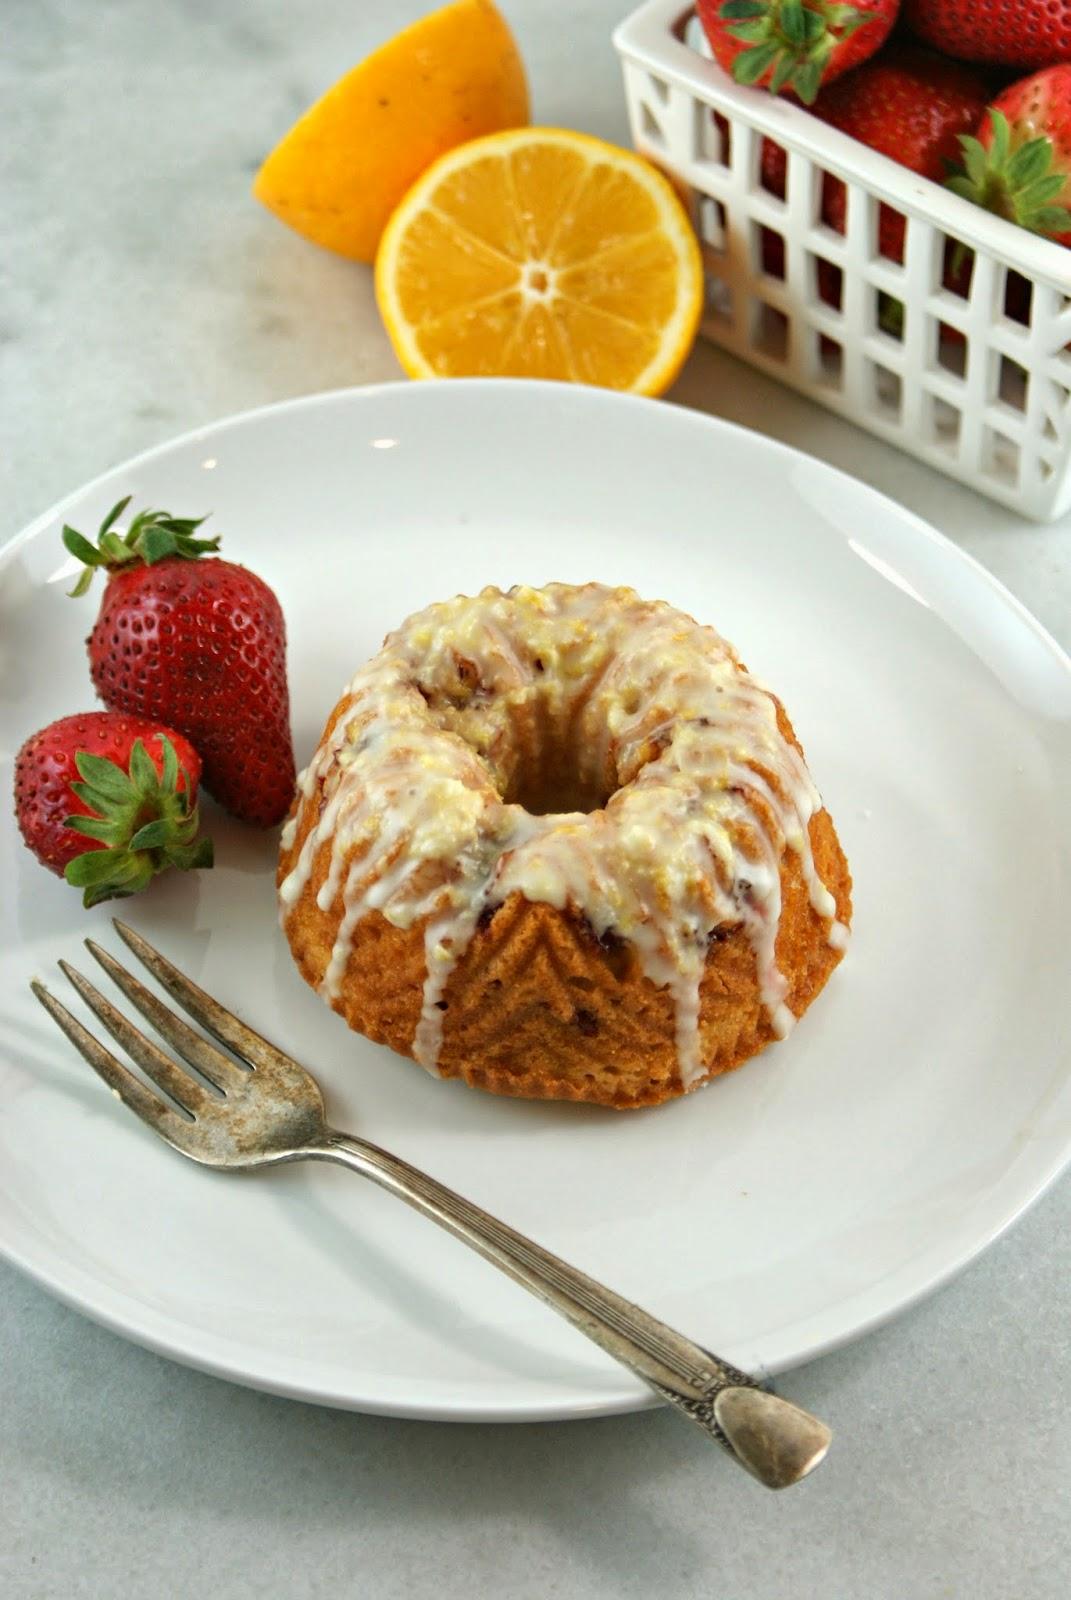 ... : Mini Meyer Lemon and Strawberry Bundt Cakes | Secret Recipe Club